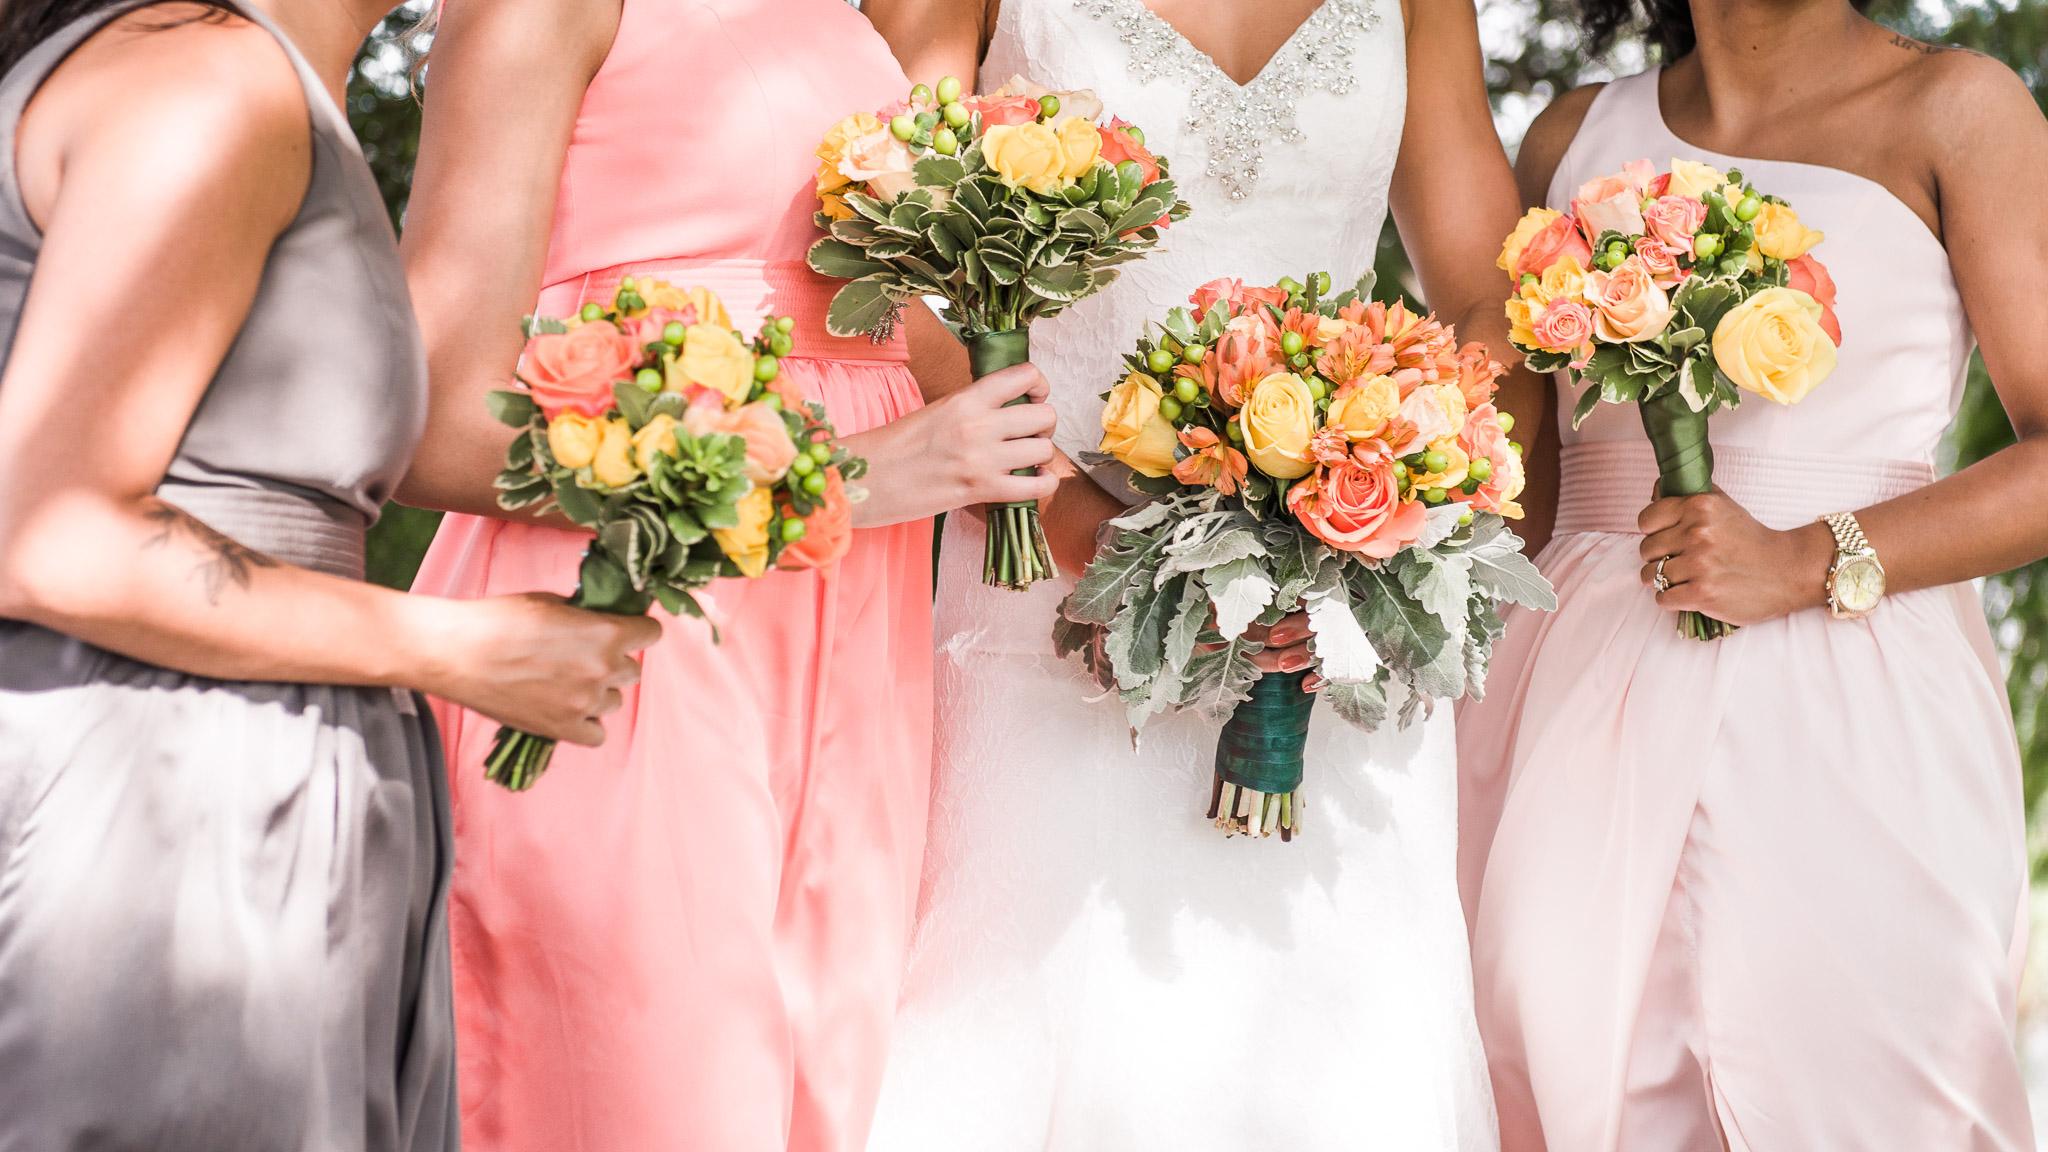 KateTaramykinStudios-Kissimmee-Wedding-Arzola-14.jpg